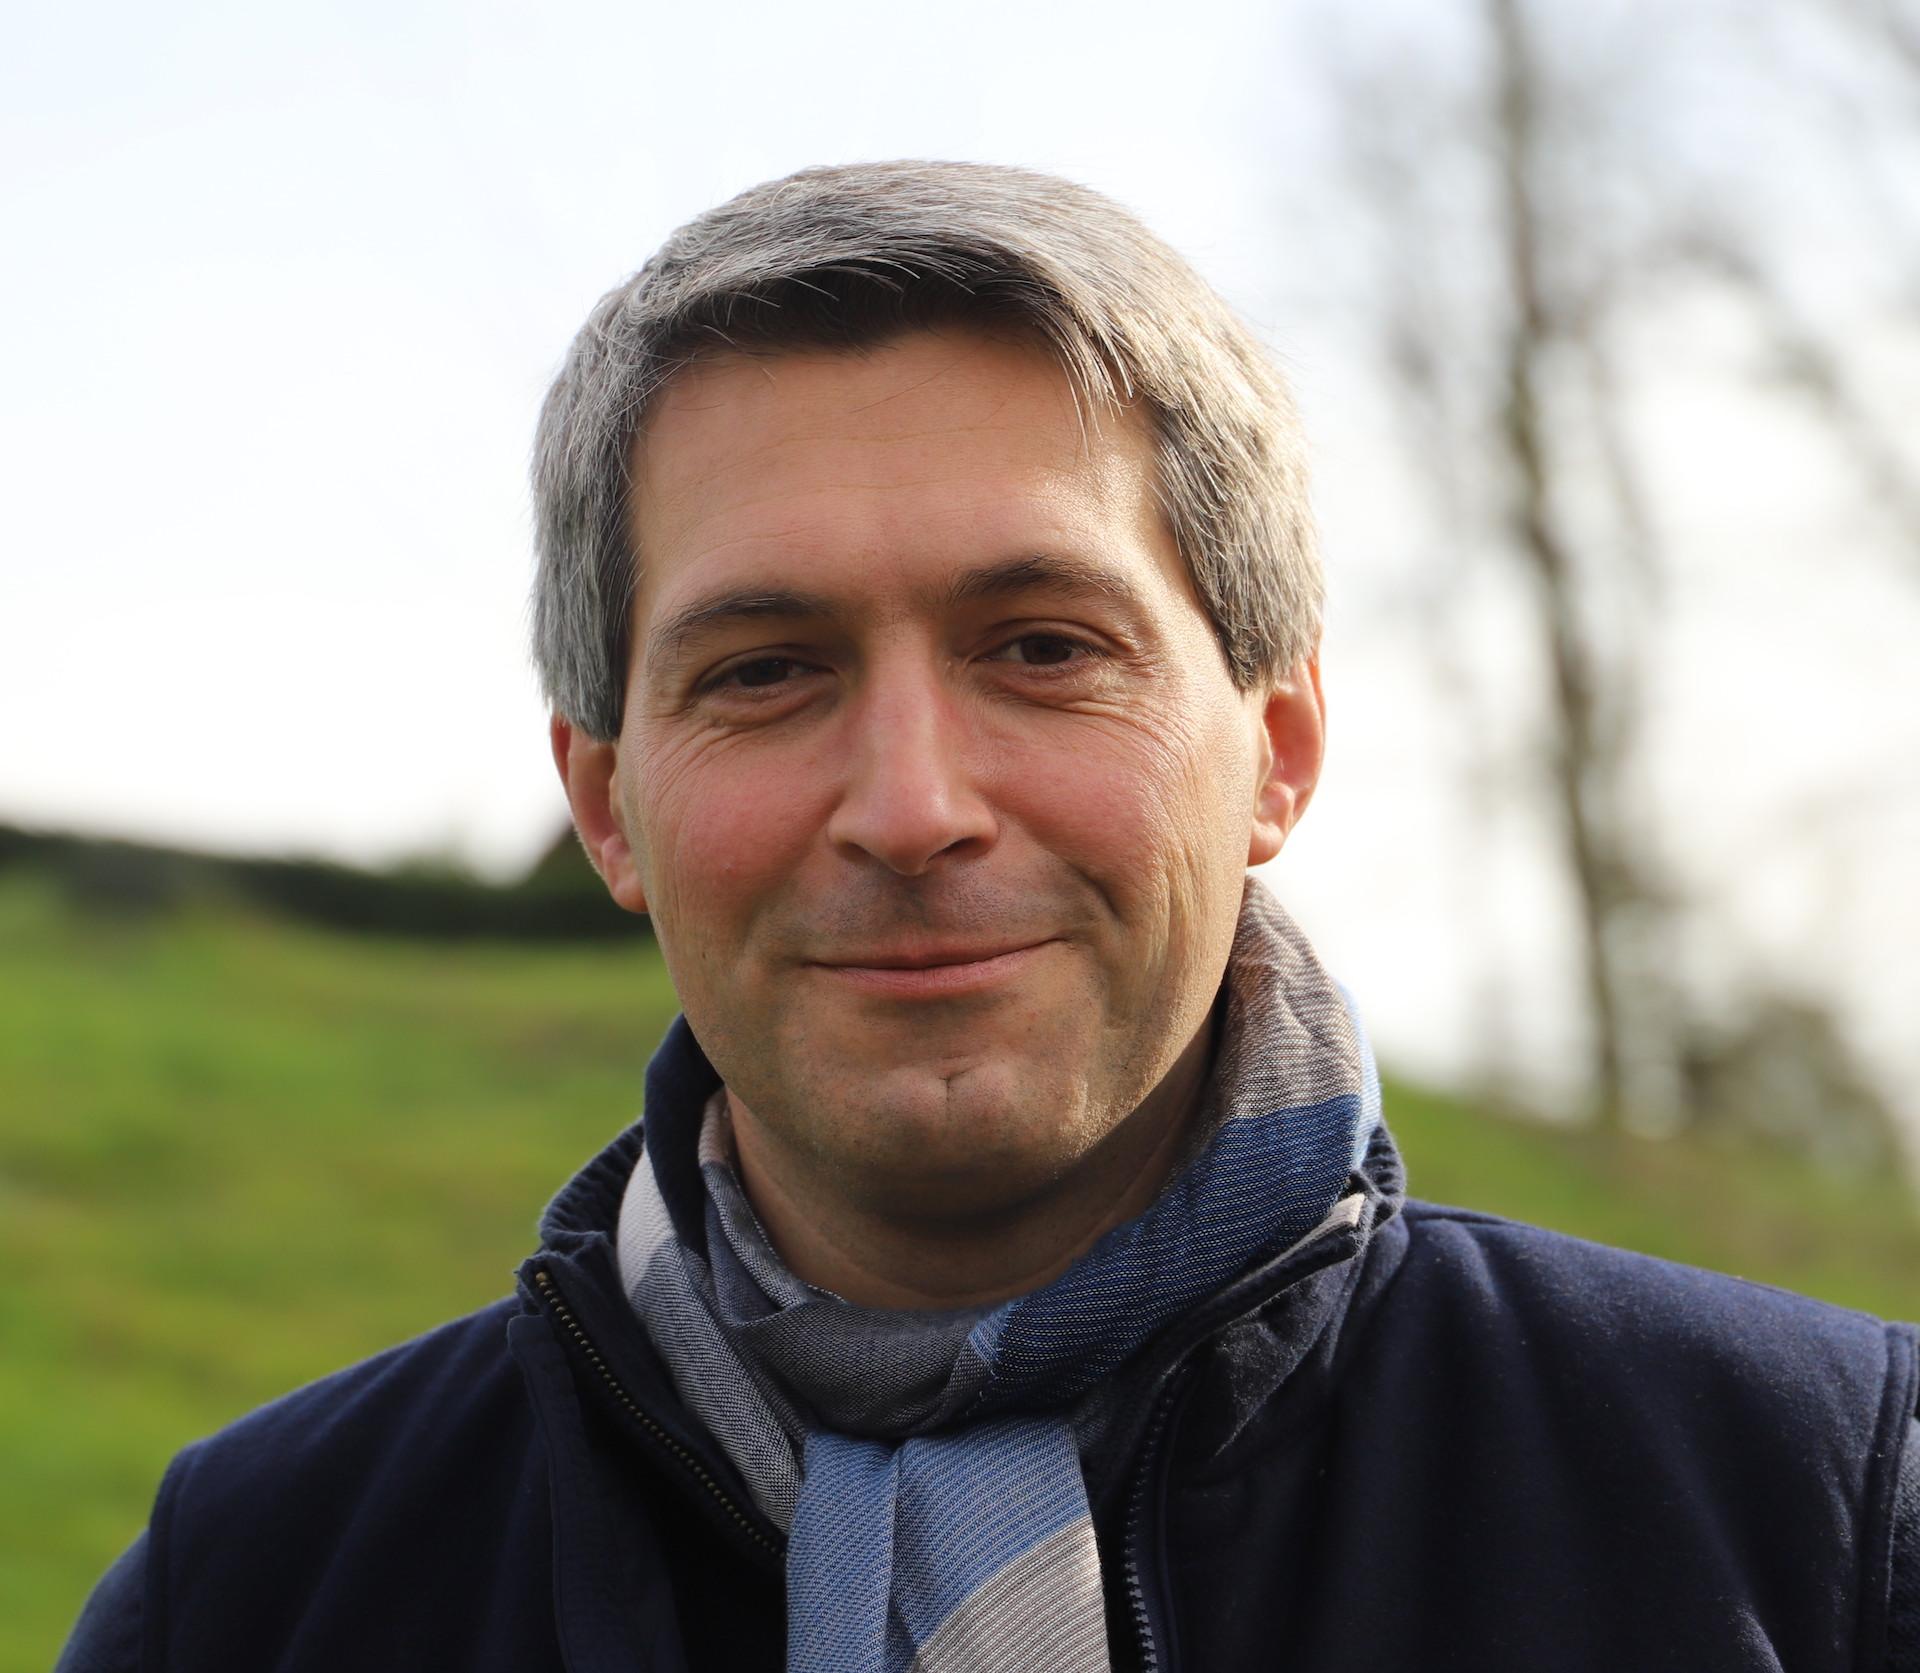 Benoît Sadry